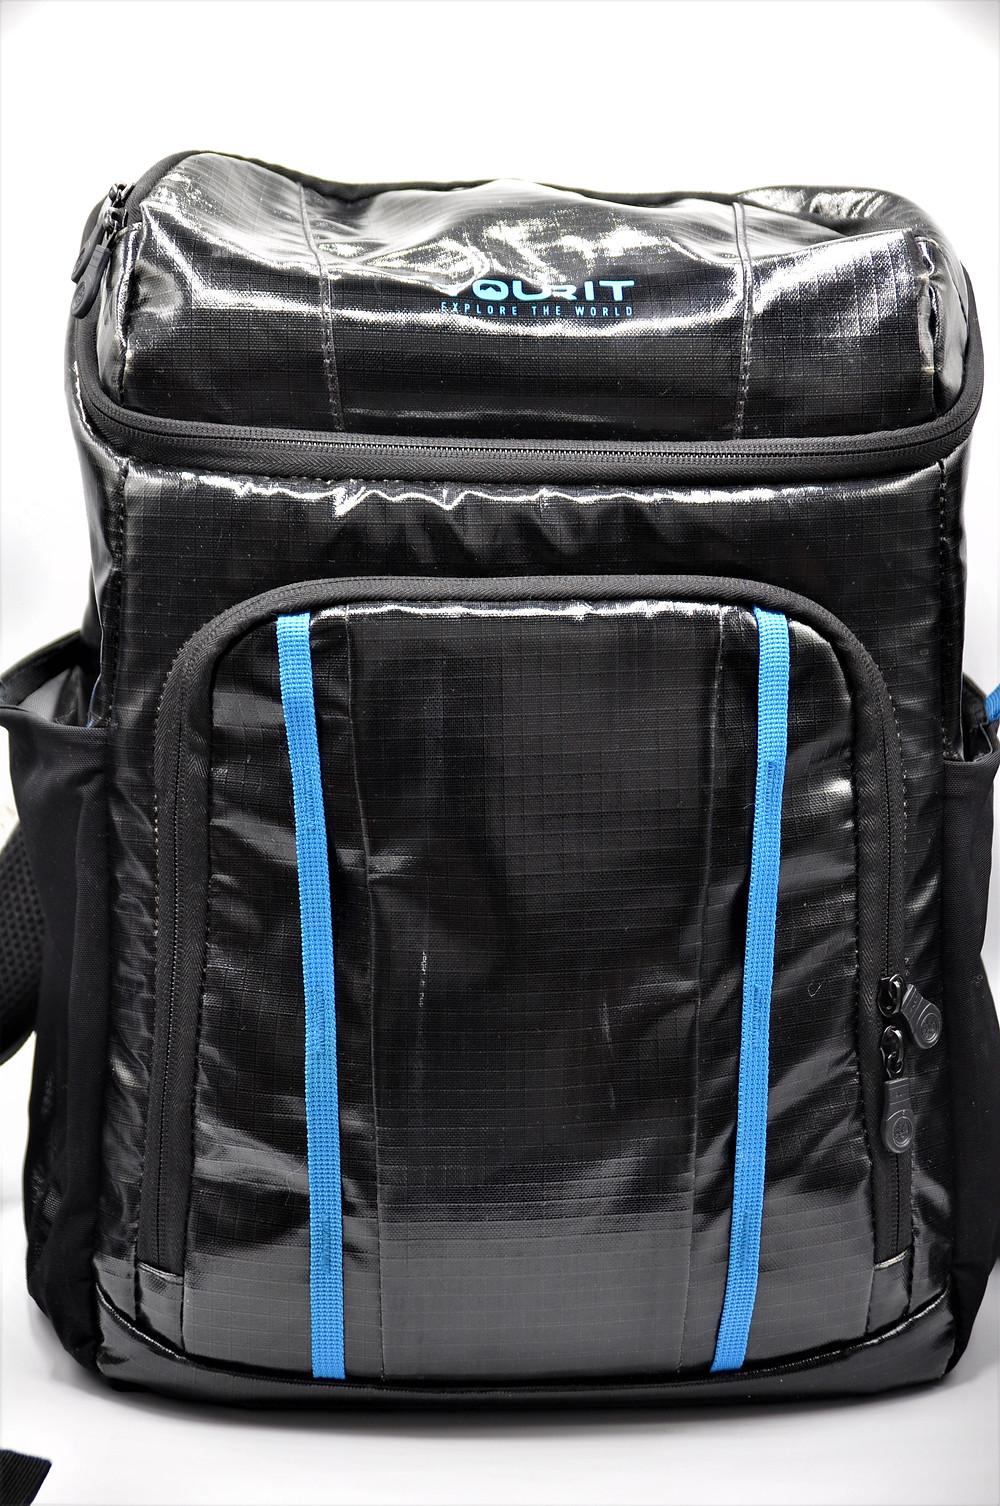 Tourit - convert changing bag - mamytales